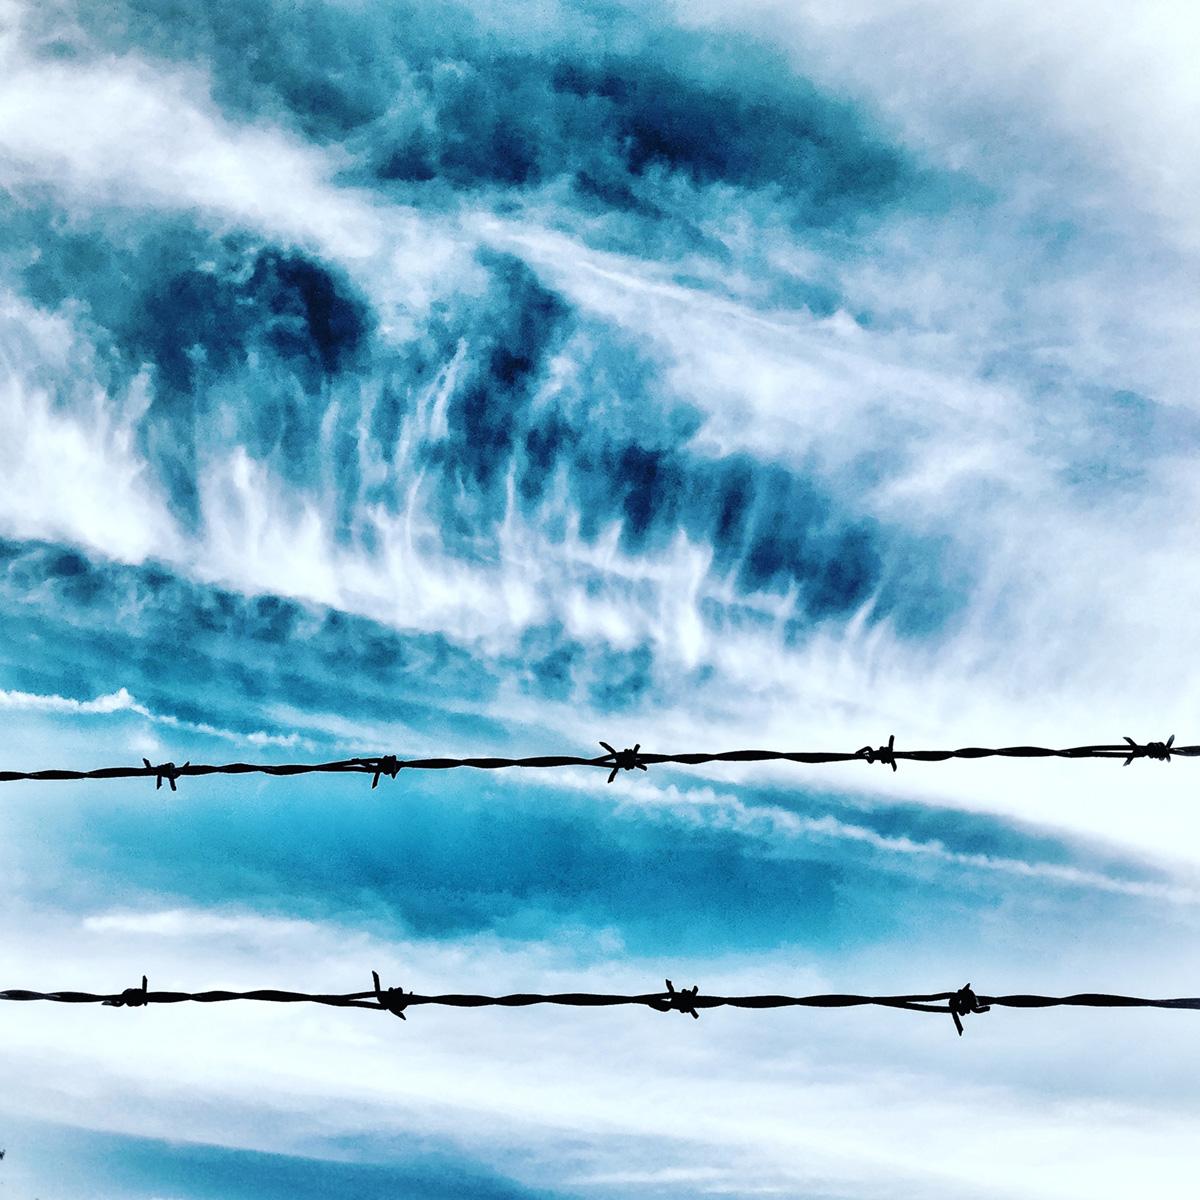 Cloudy Sky Through the Barbs 1